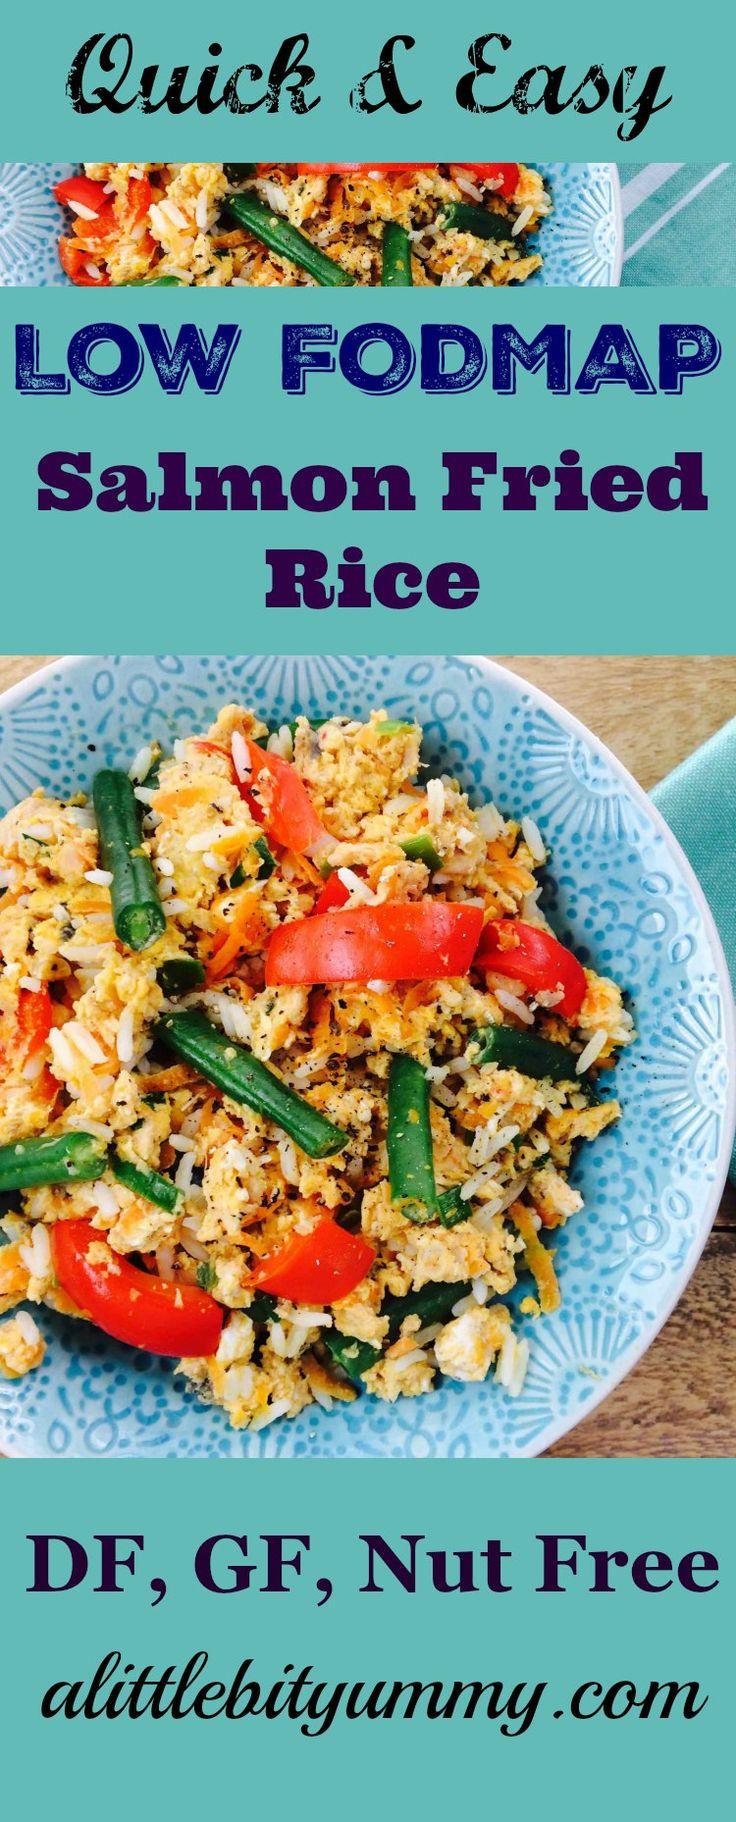 Easy Salmon Fried Rice